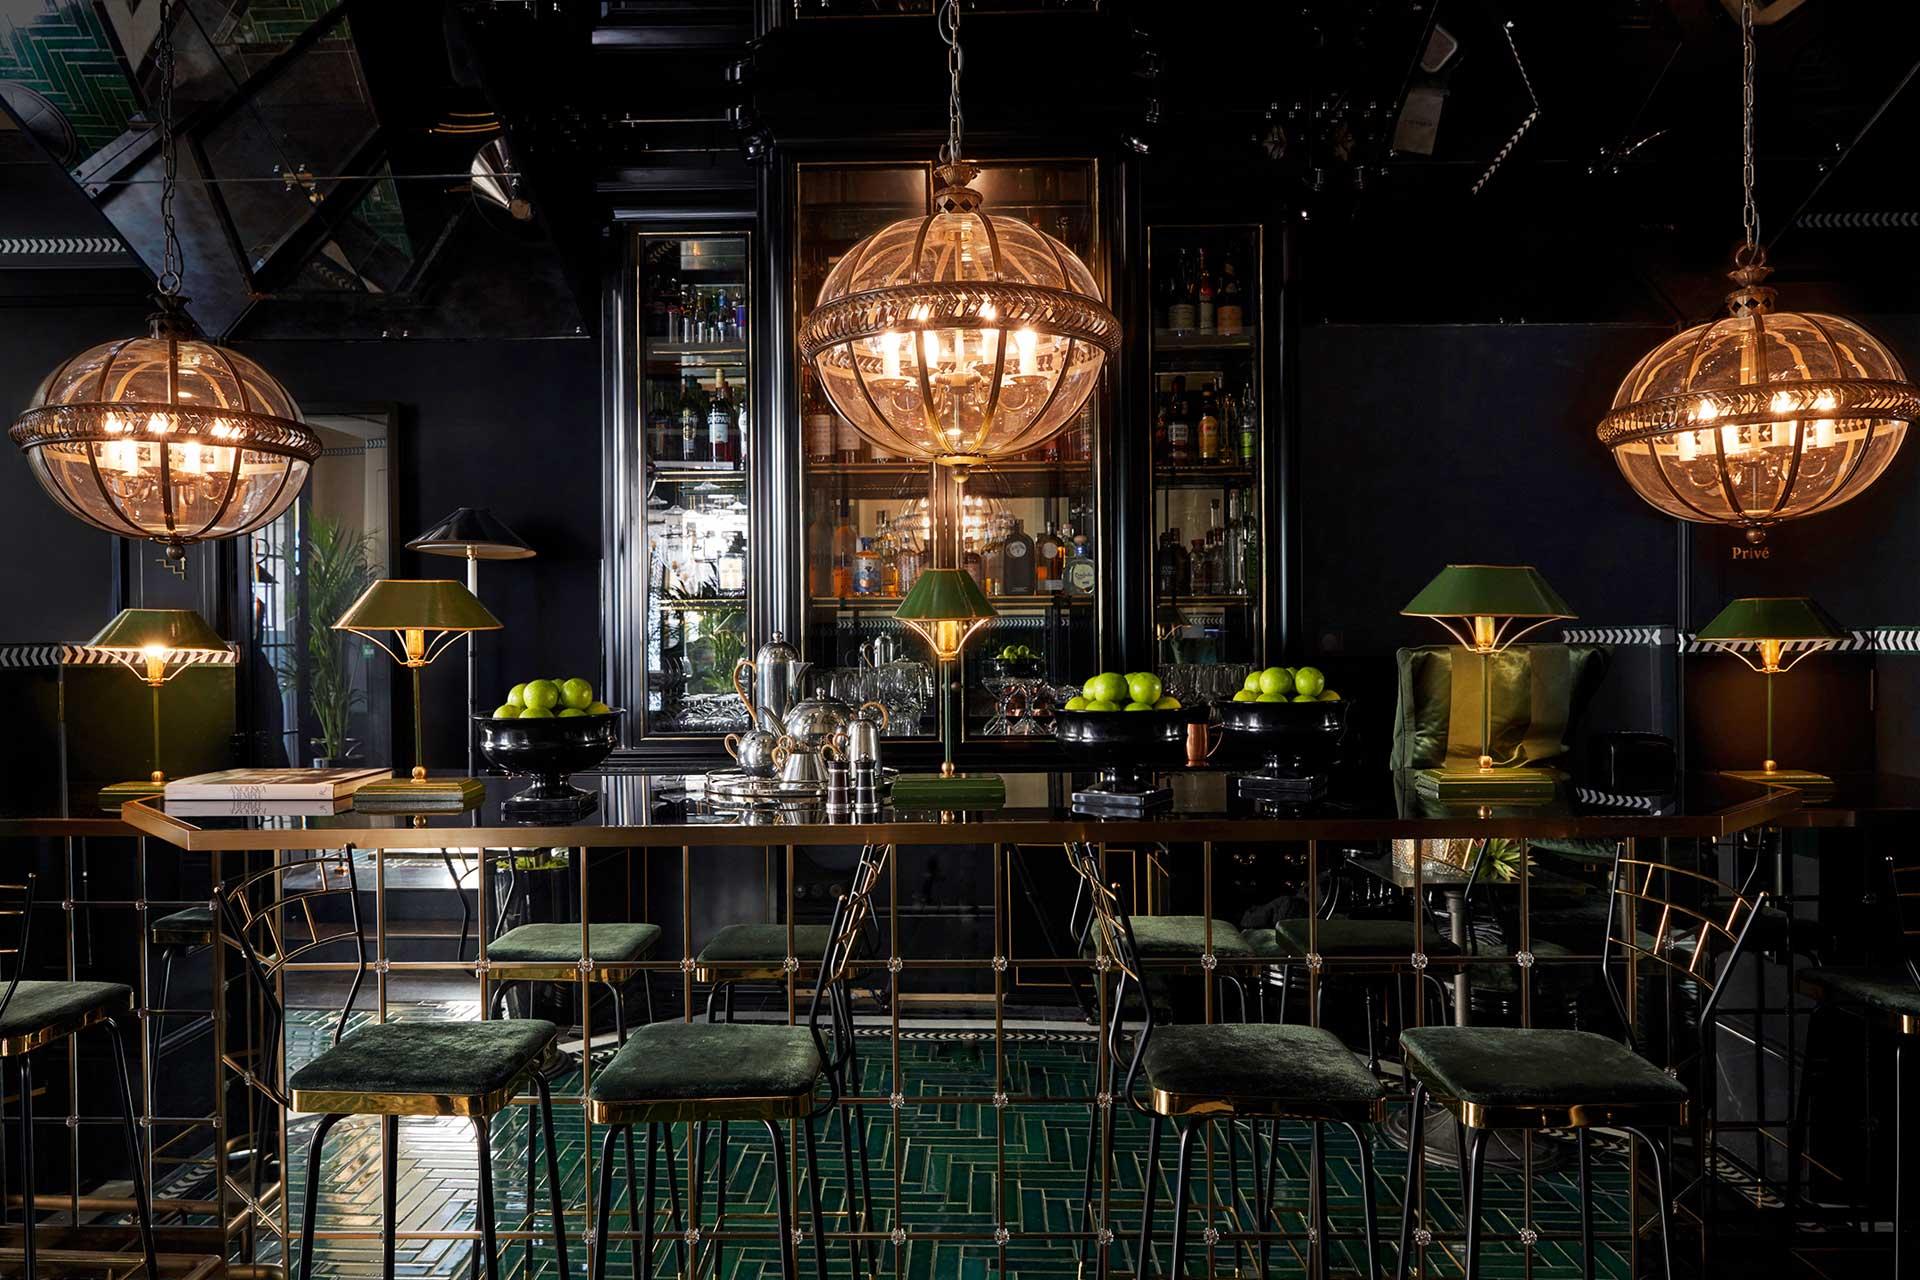 Galanga bar and restaurant at Monsieur George in Paris, France